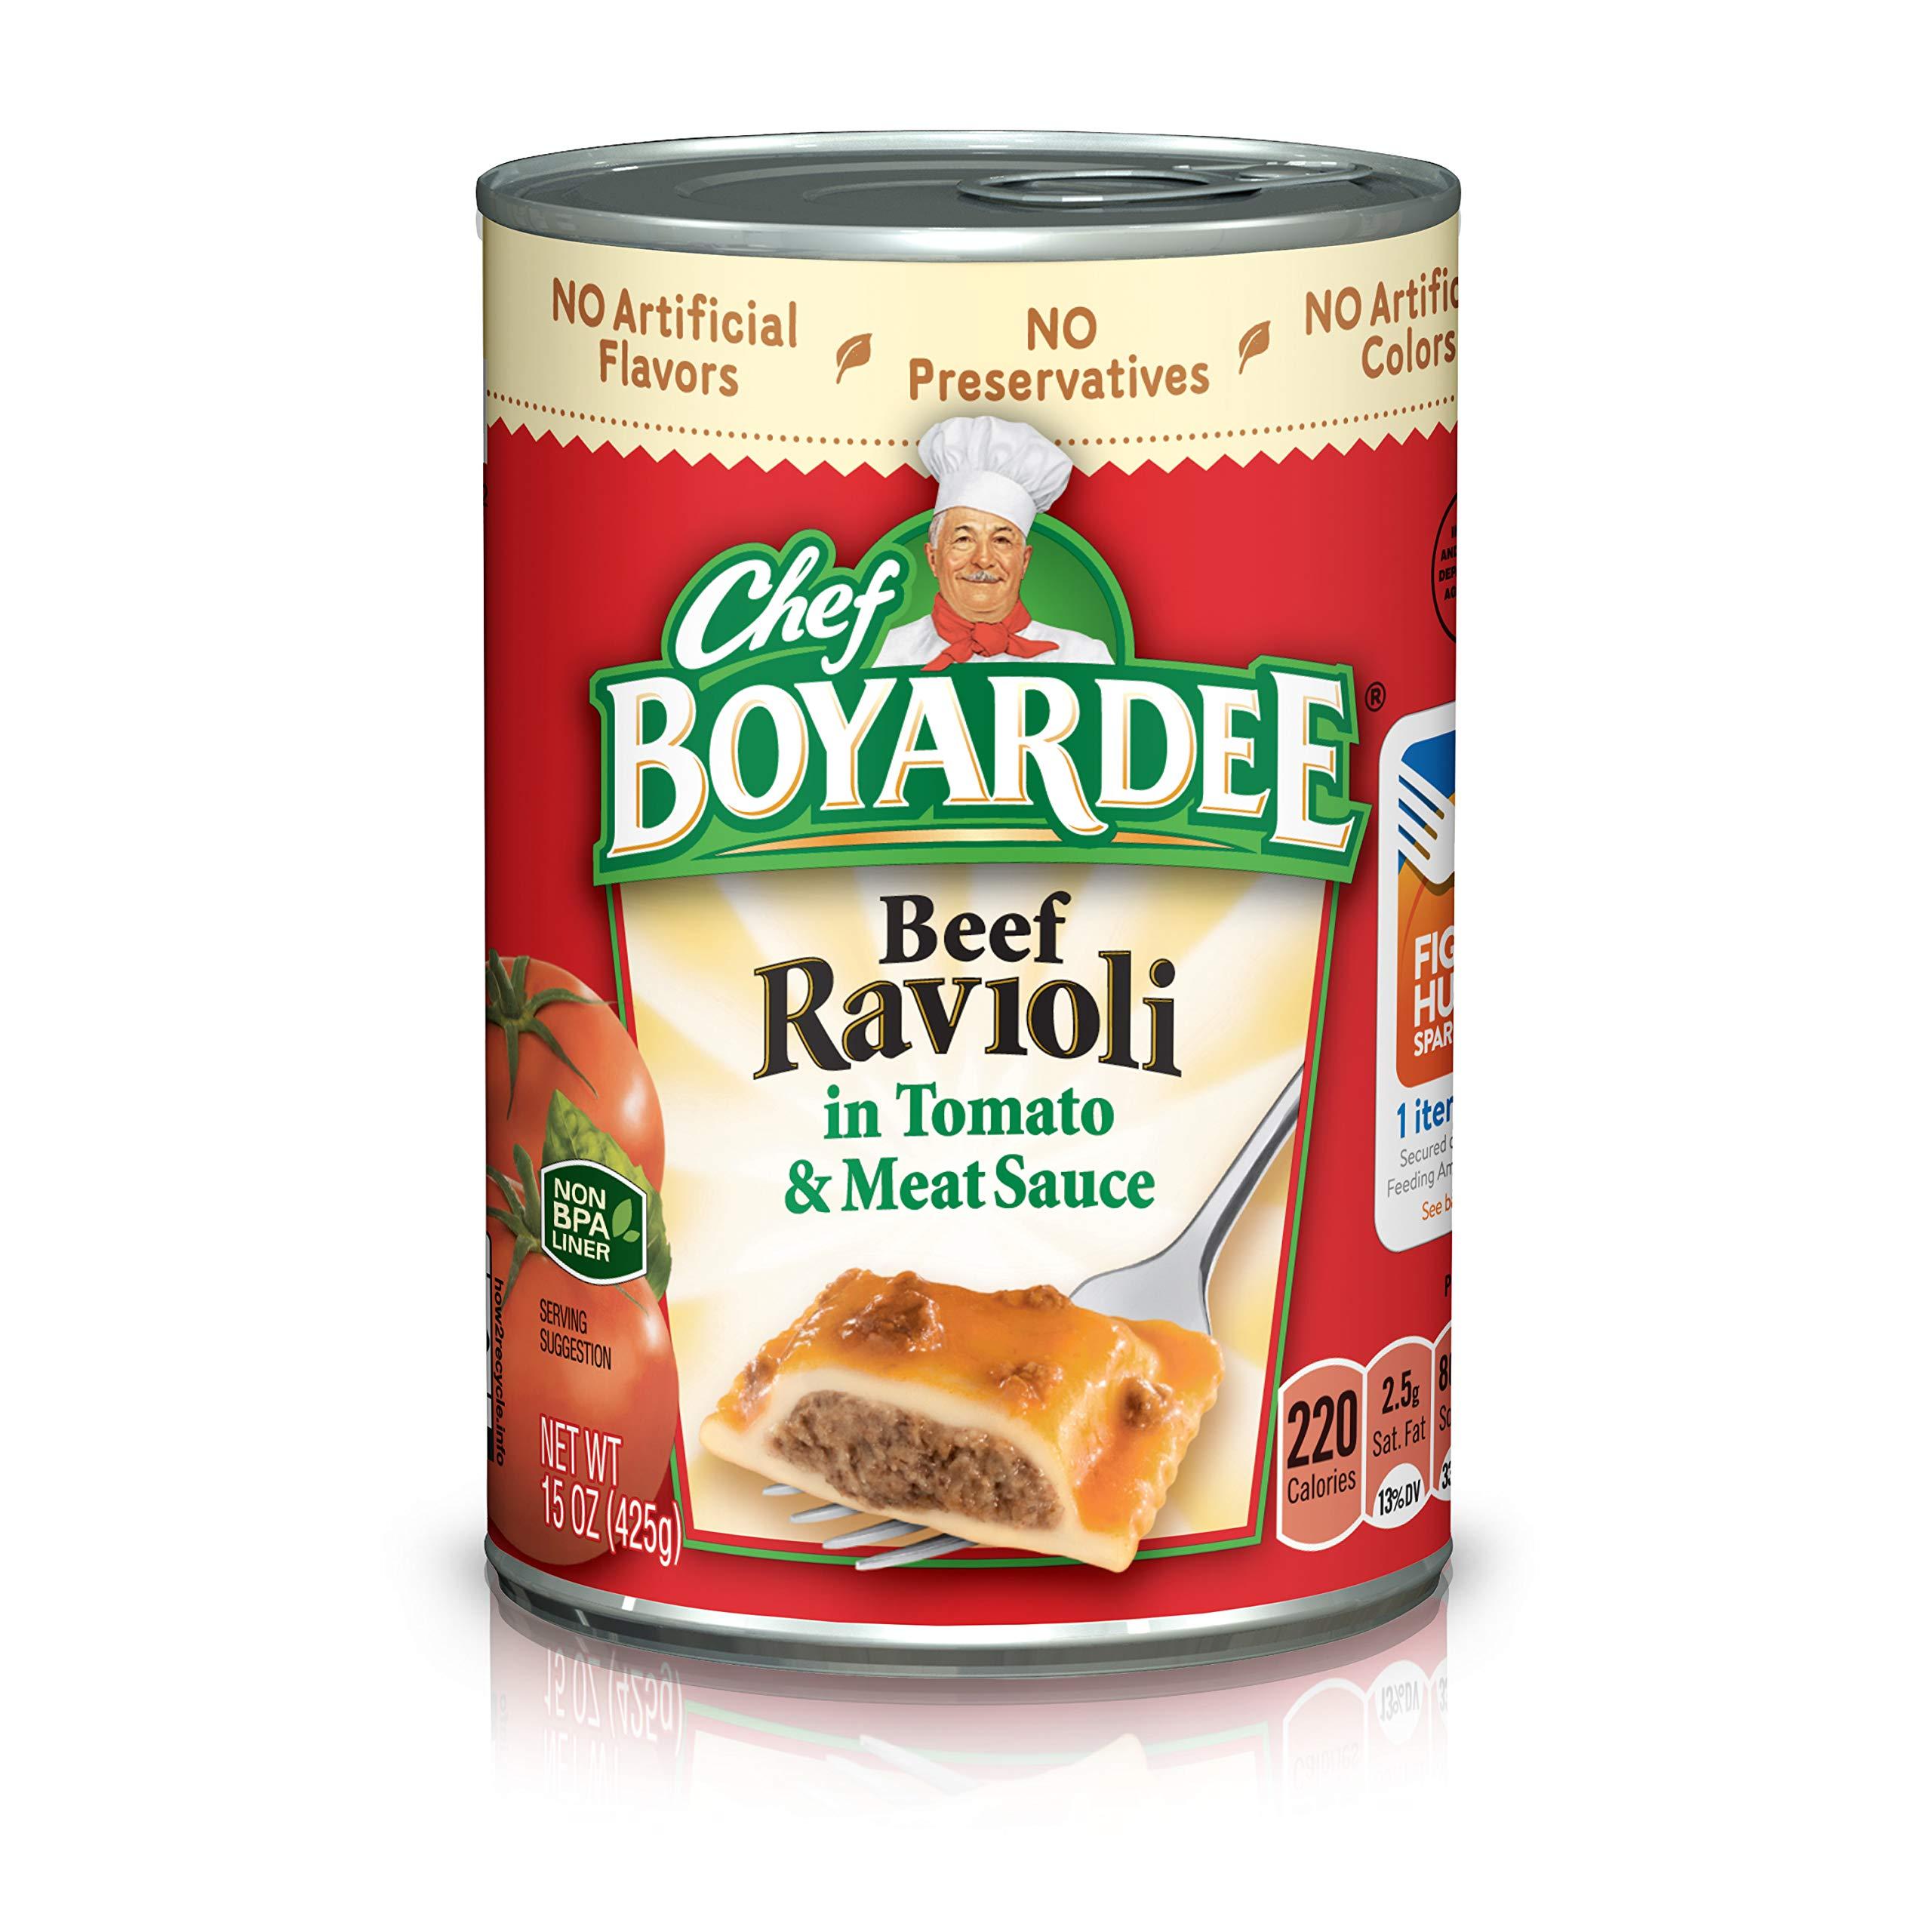 Chef Boyardee Beef Ravioli, 15 Oz, 4 Pack